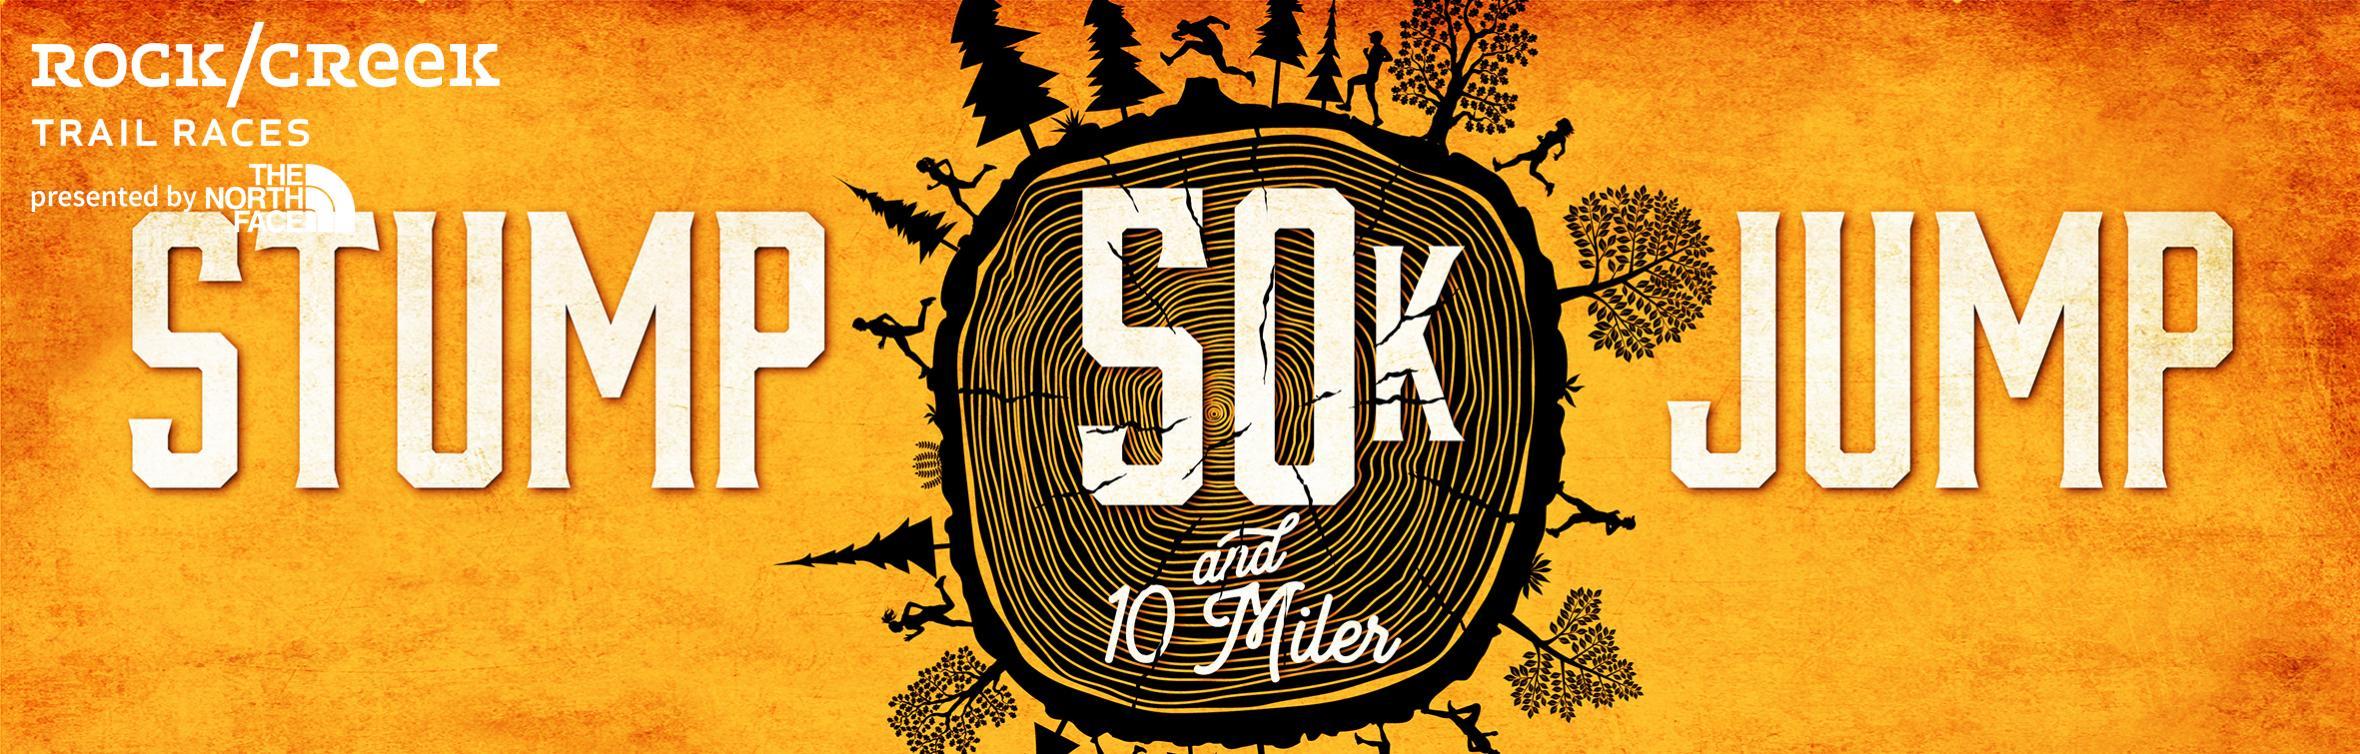 stump jump 50k and 10 miler